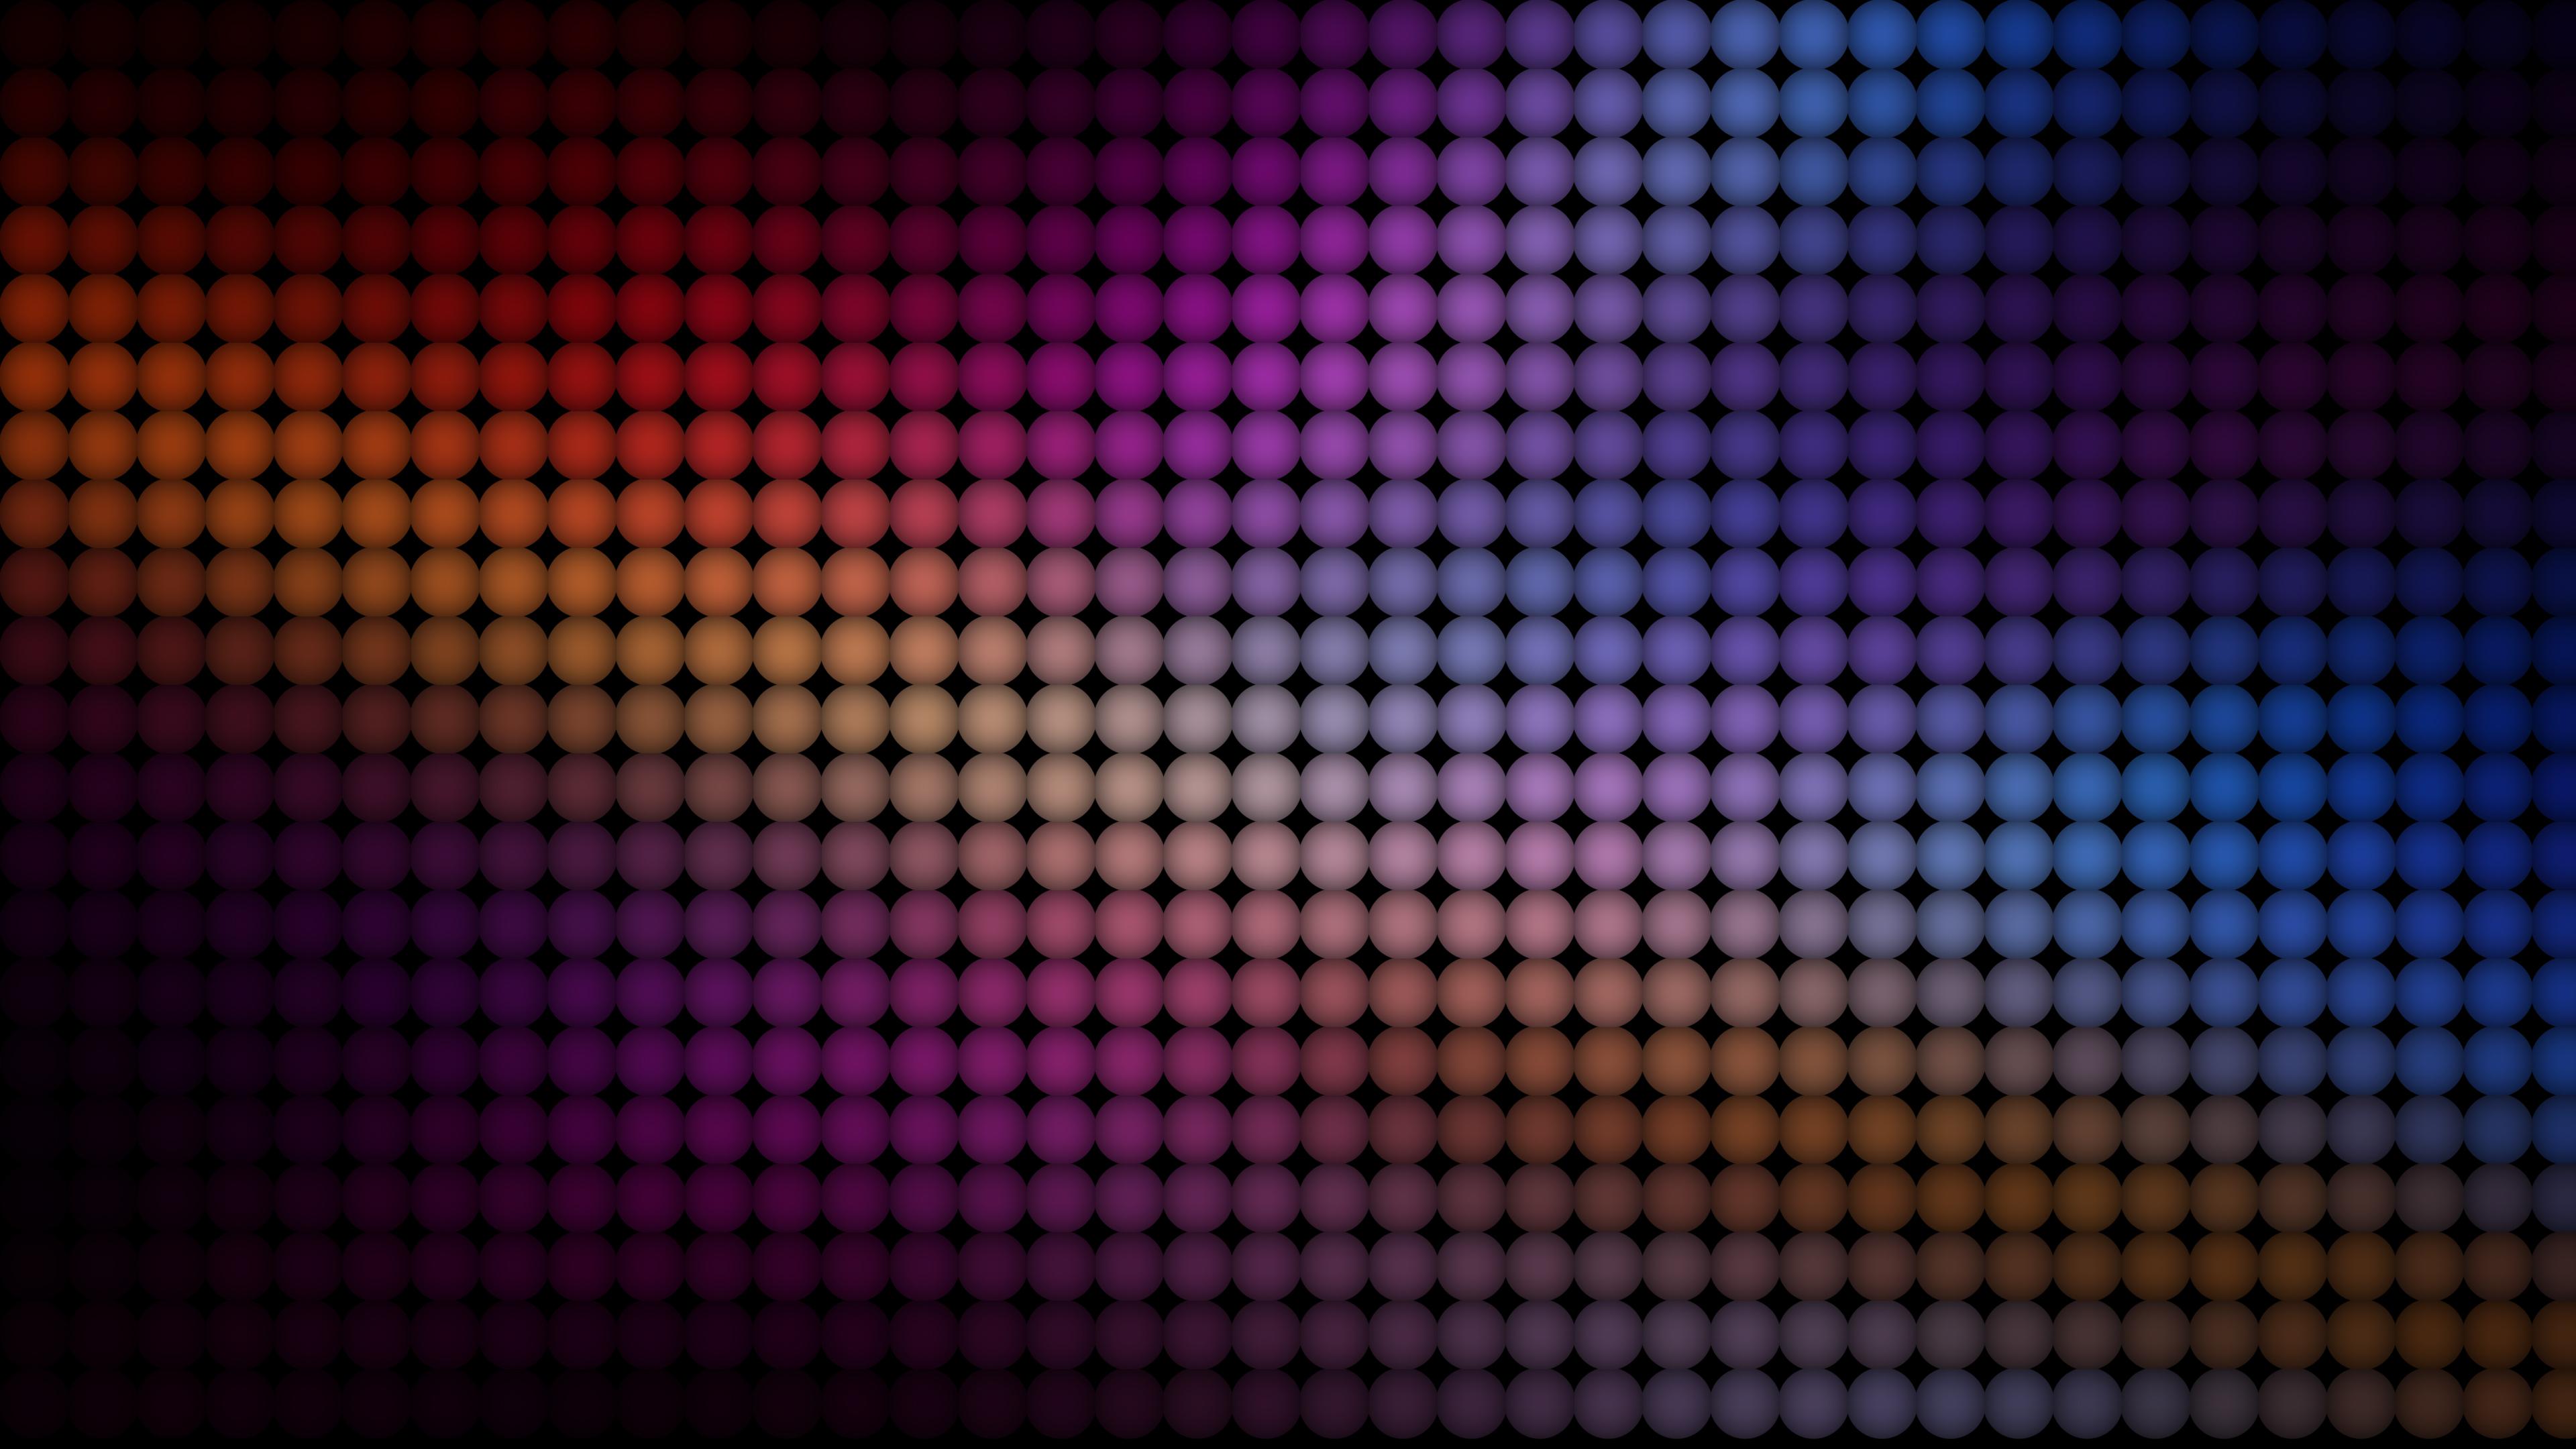 abstract dooted balls 1575660263 - Abstract Dooted Balls -